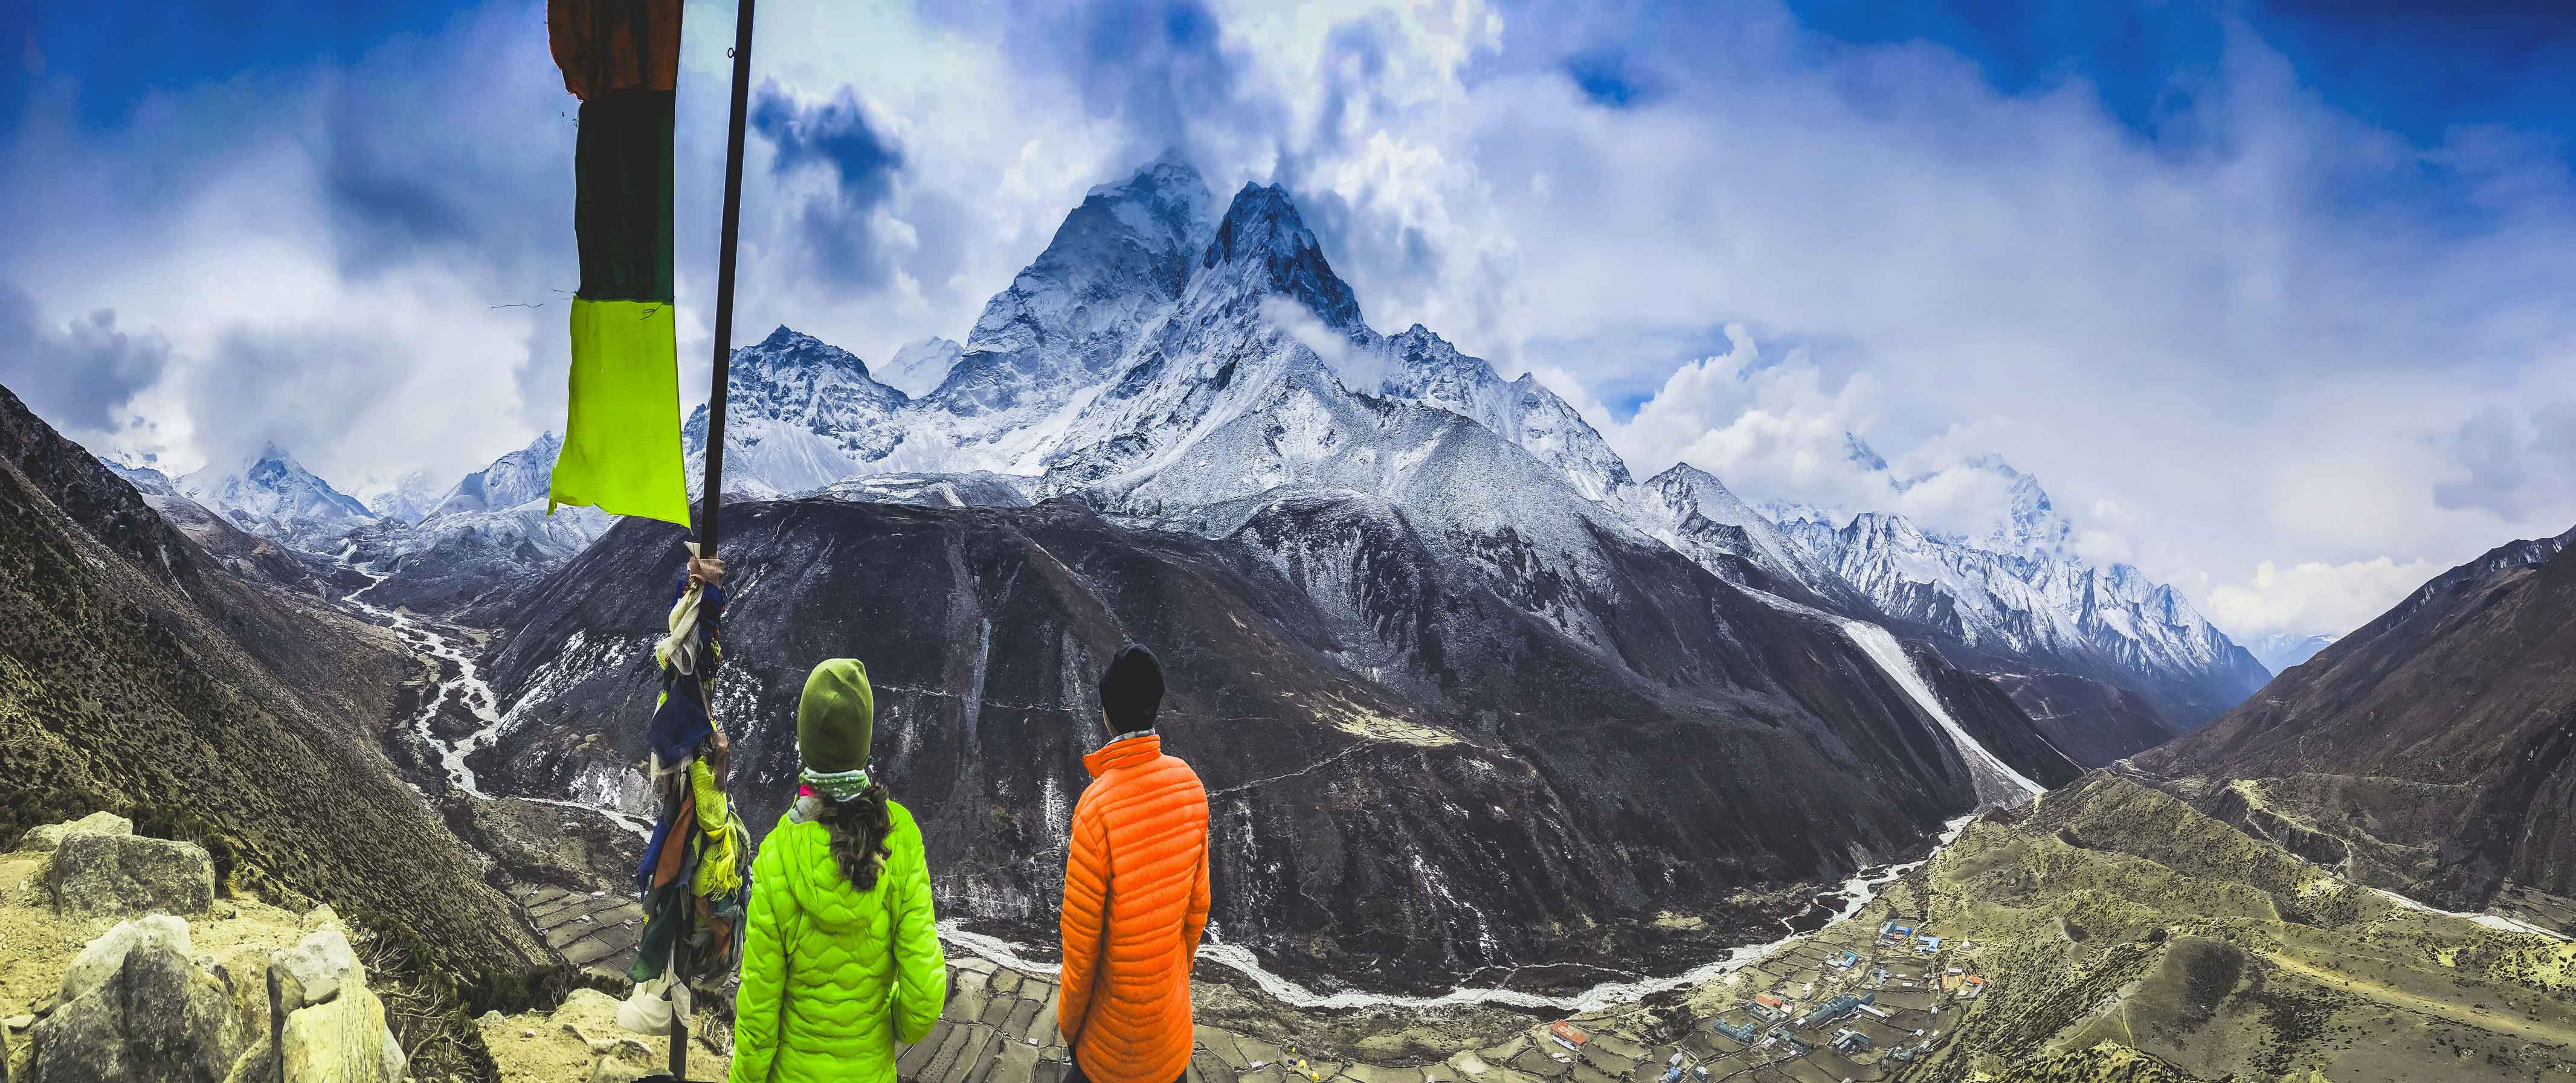 everest-base-camp-and-kalapatthar-trek